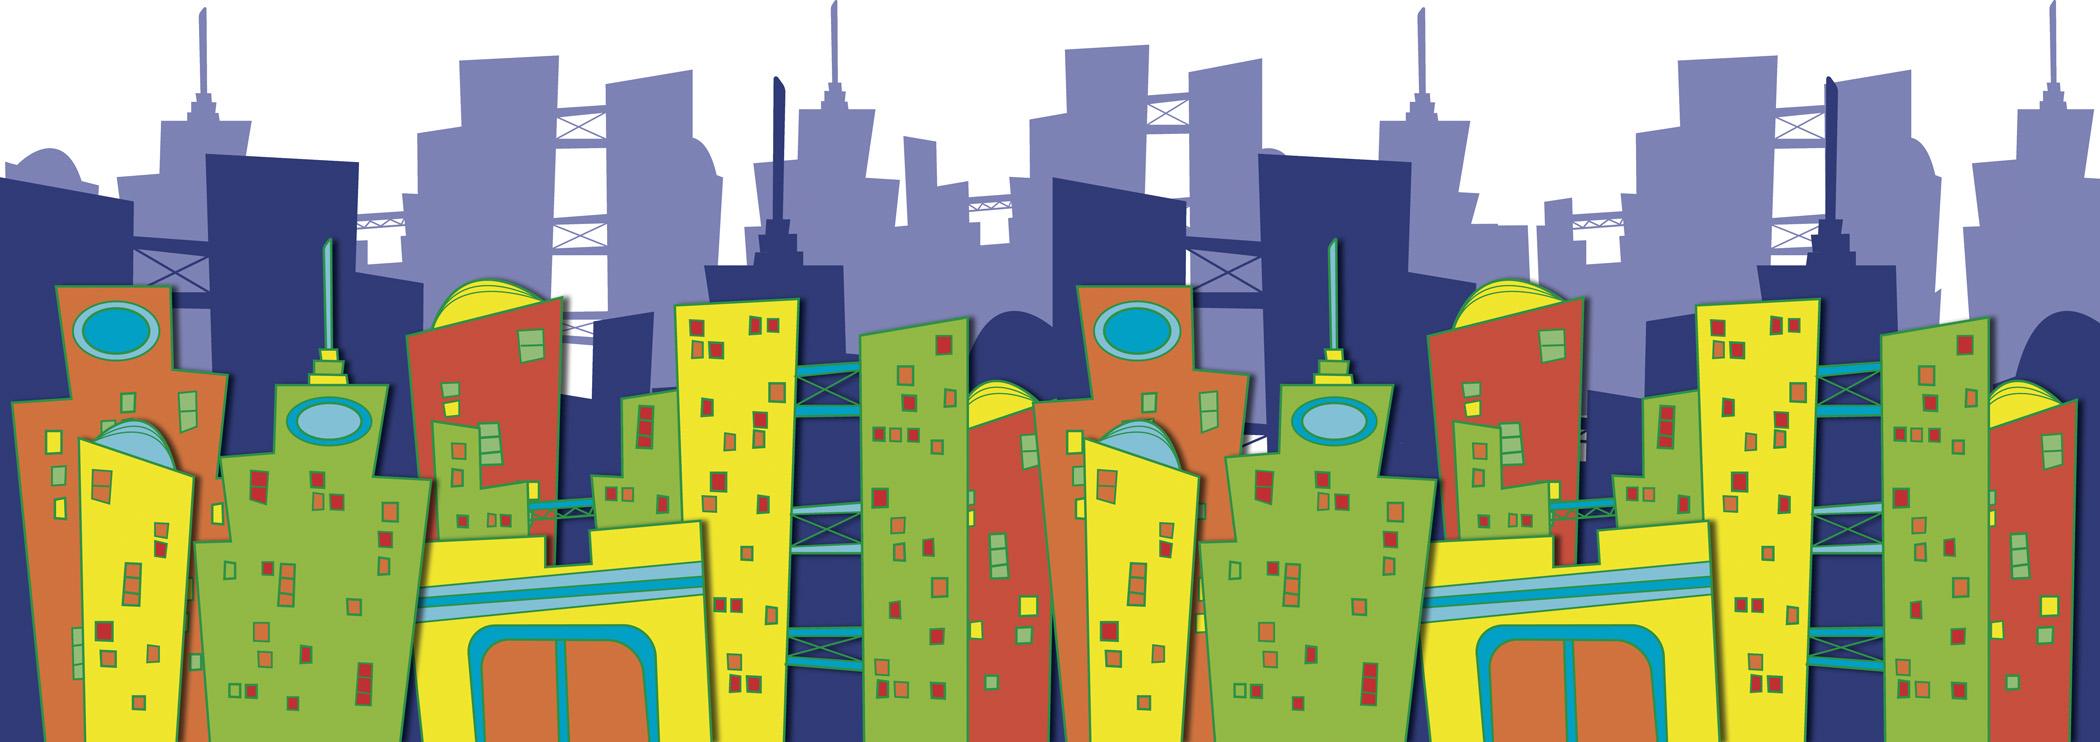 City clipart City Panda Clipart Free city%20clipart